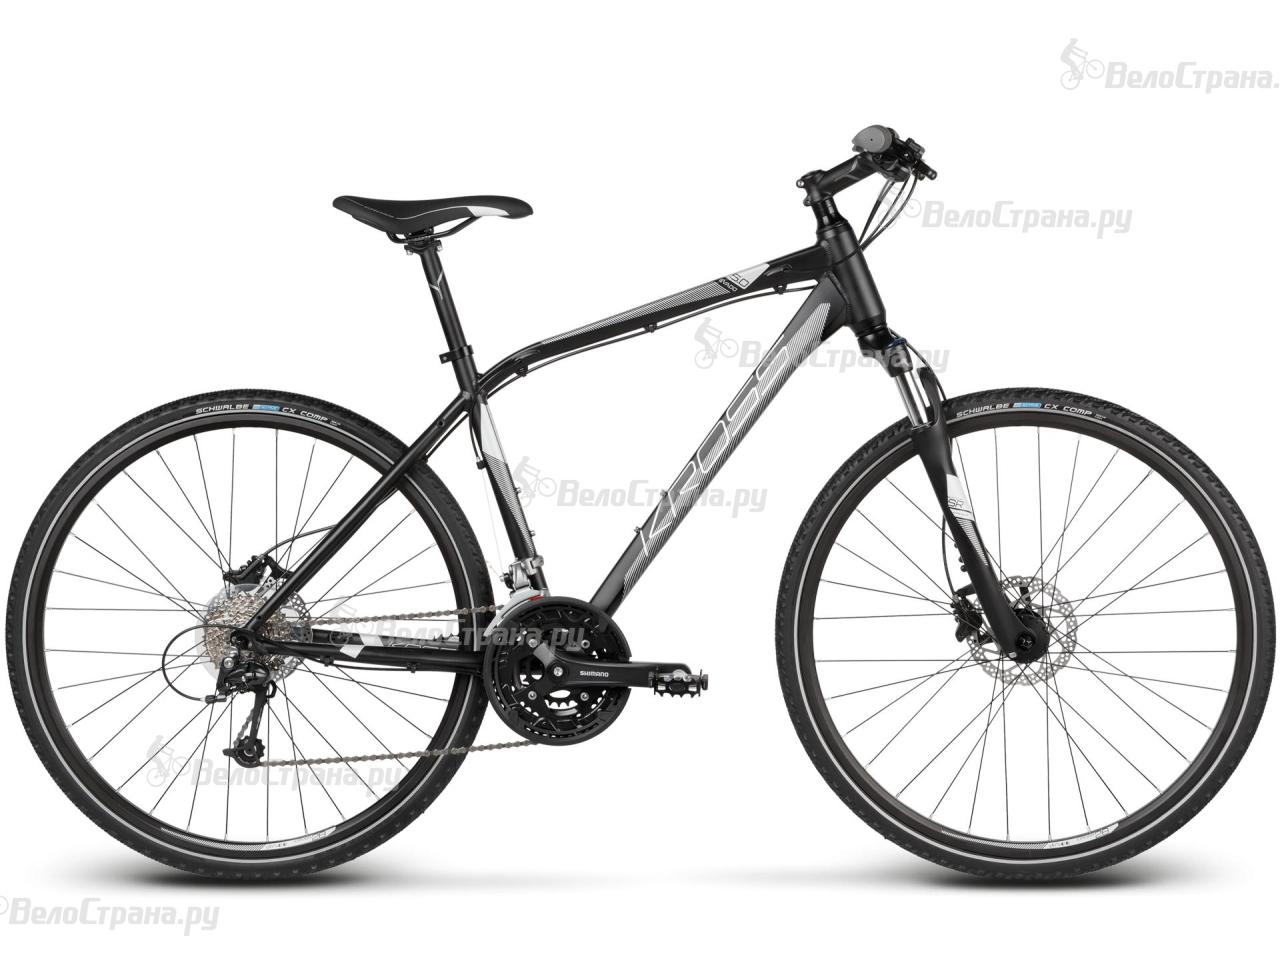 Велосипед Kross Evado 5.0 (2017) велосипед kross evado 1 0 lady 2017